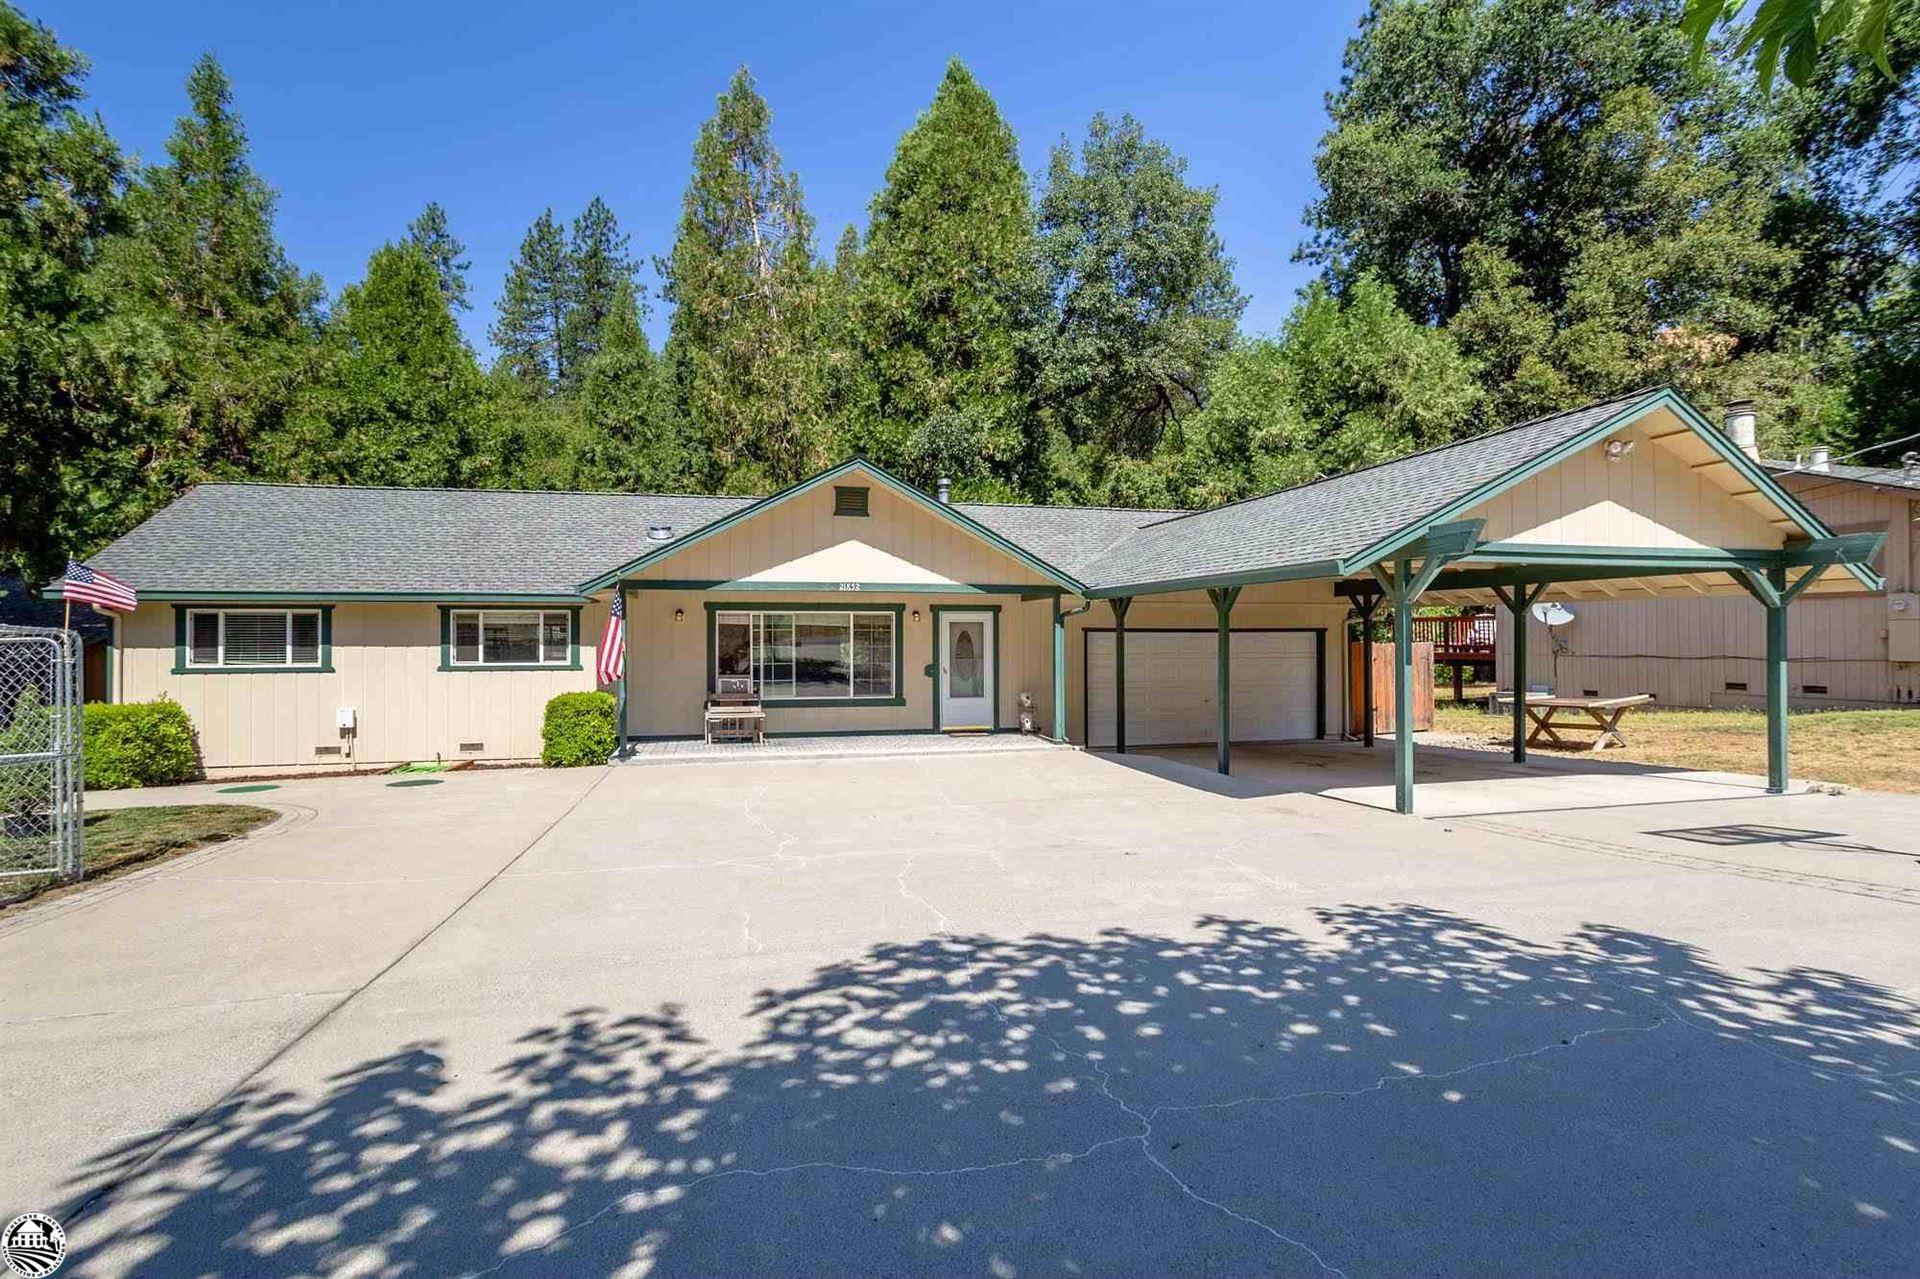 21852 Crystal Falls Dr, Sonora, CA 95370 - MLS#: 20201077